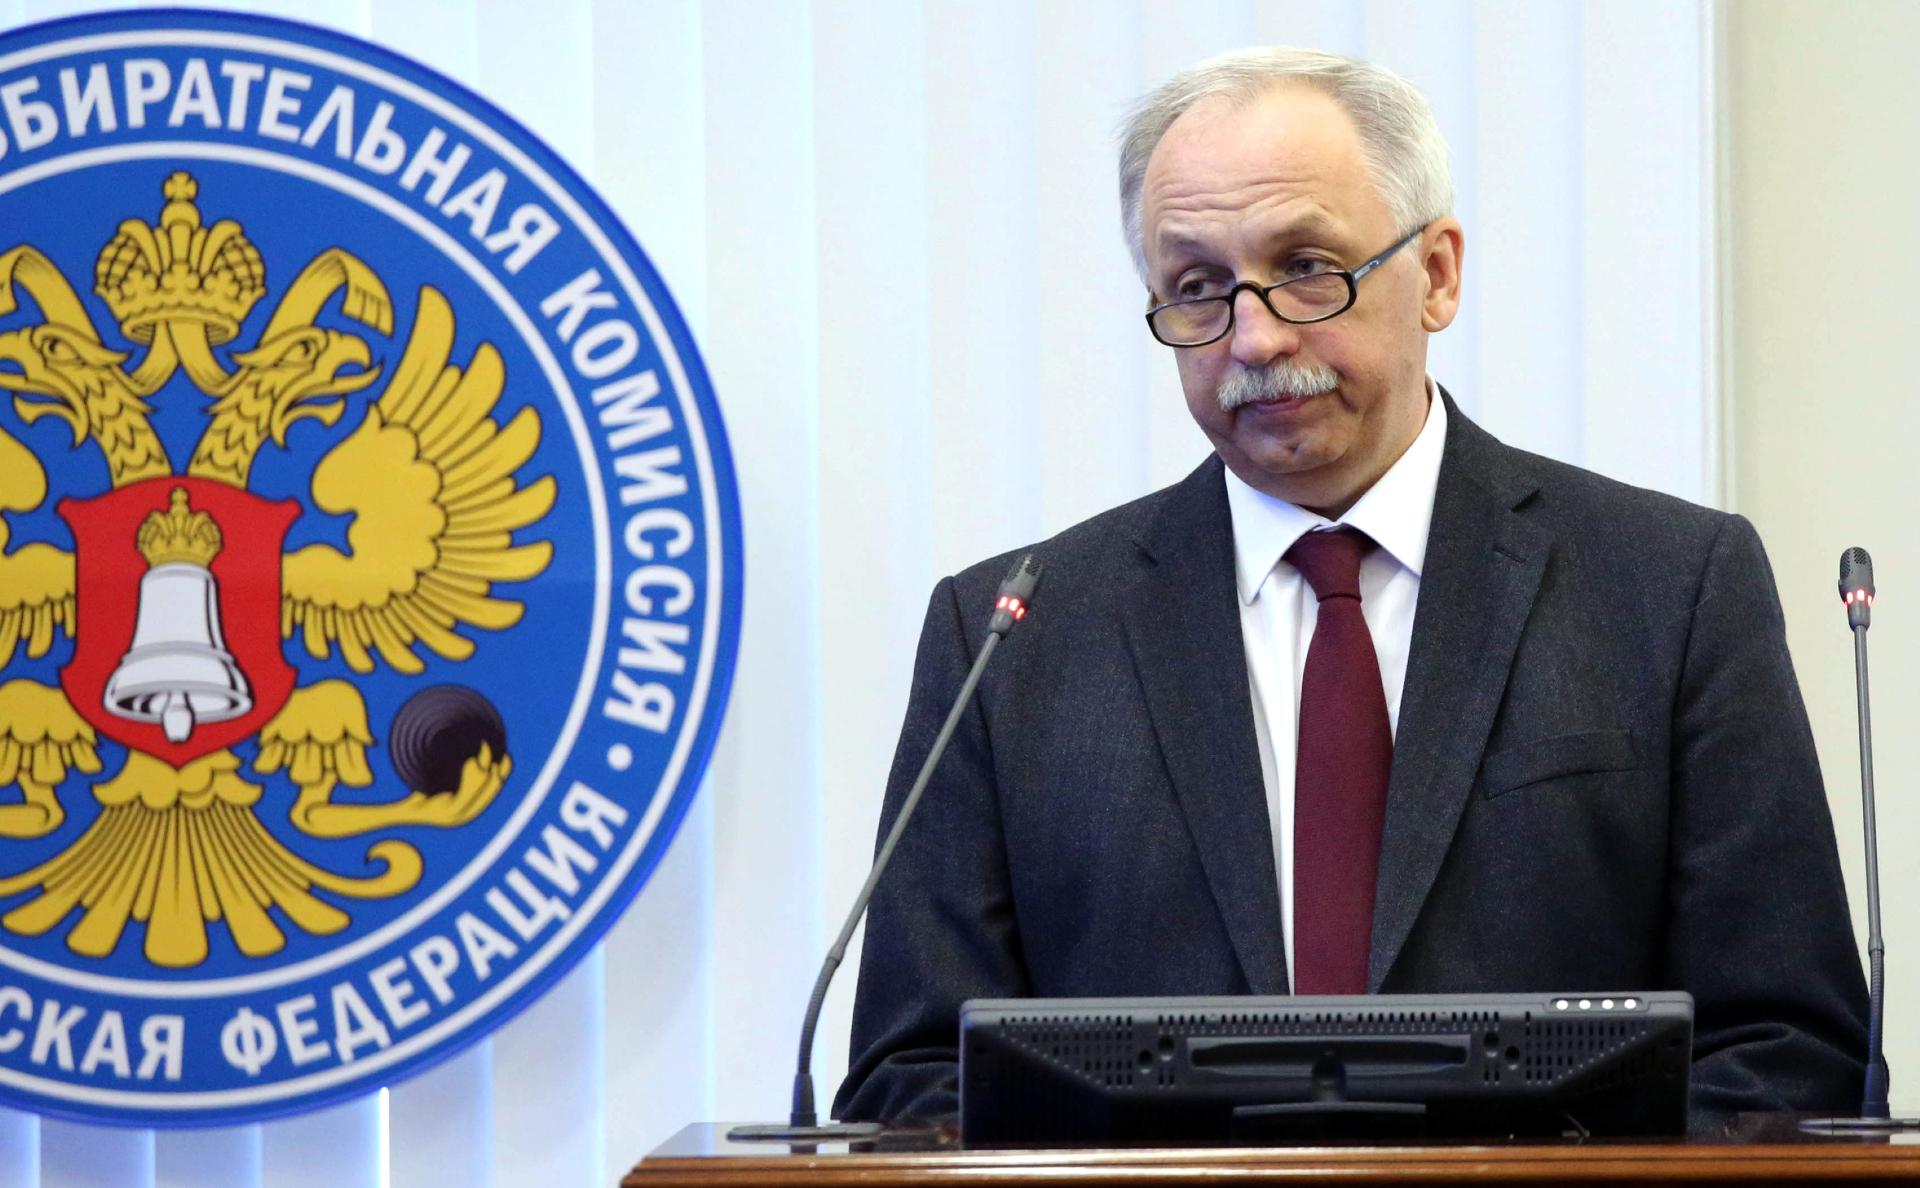 Юрий Ермолов